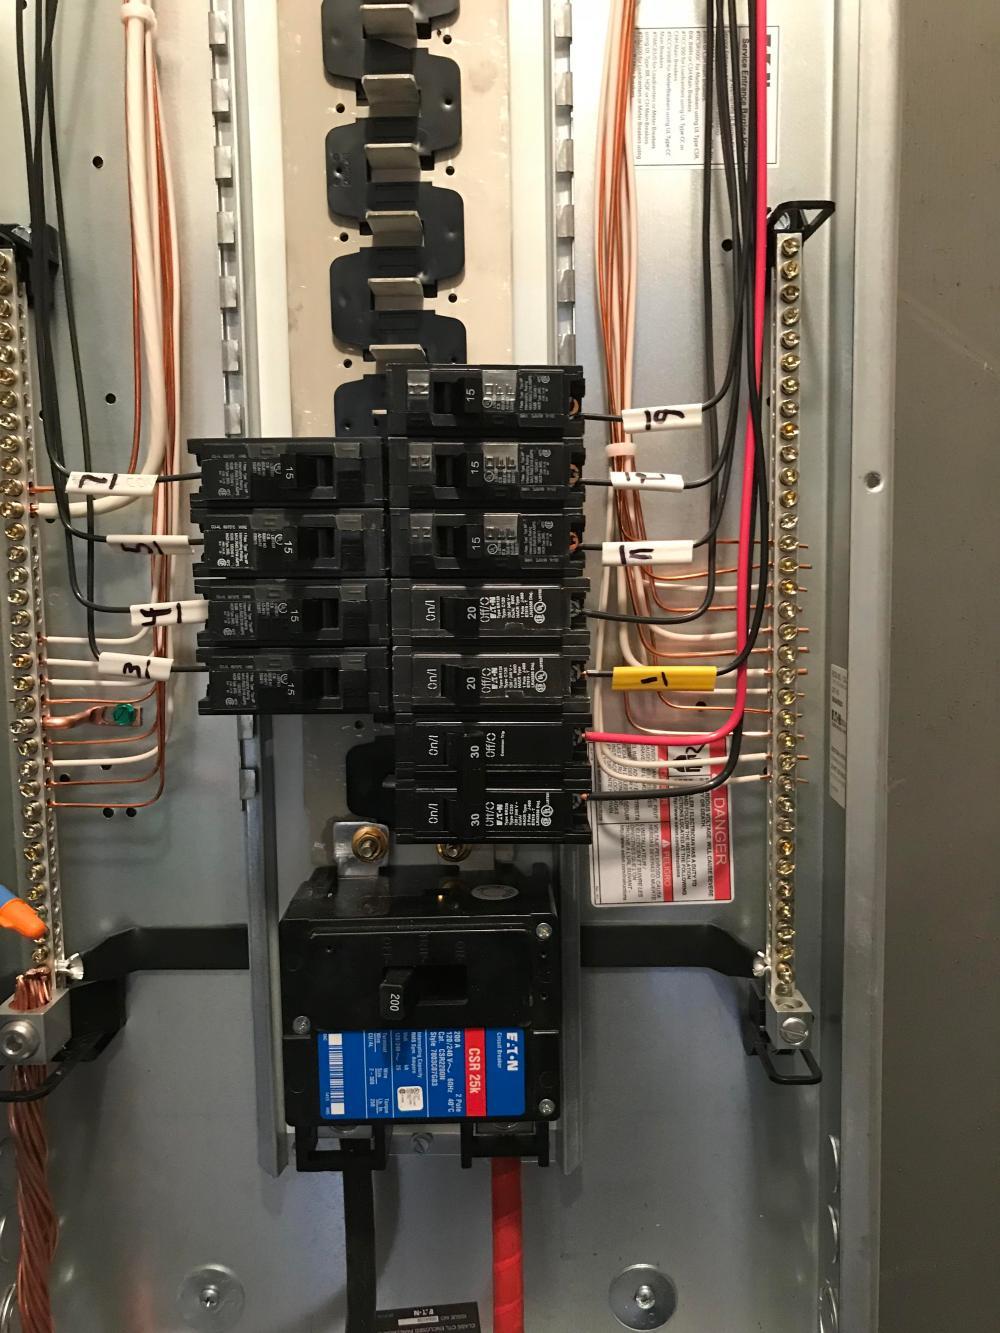 medium resolution of 200 amp panel wiring diagram wiring diagram name mix 200 amp panel wiring wiring diagram expert